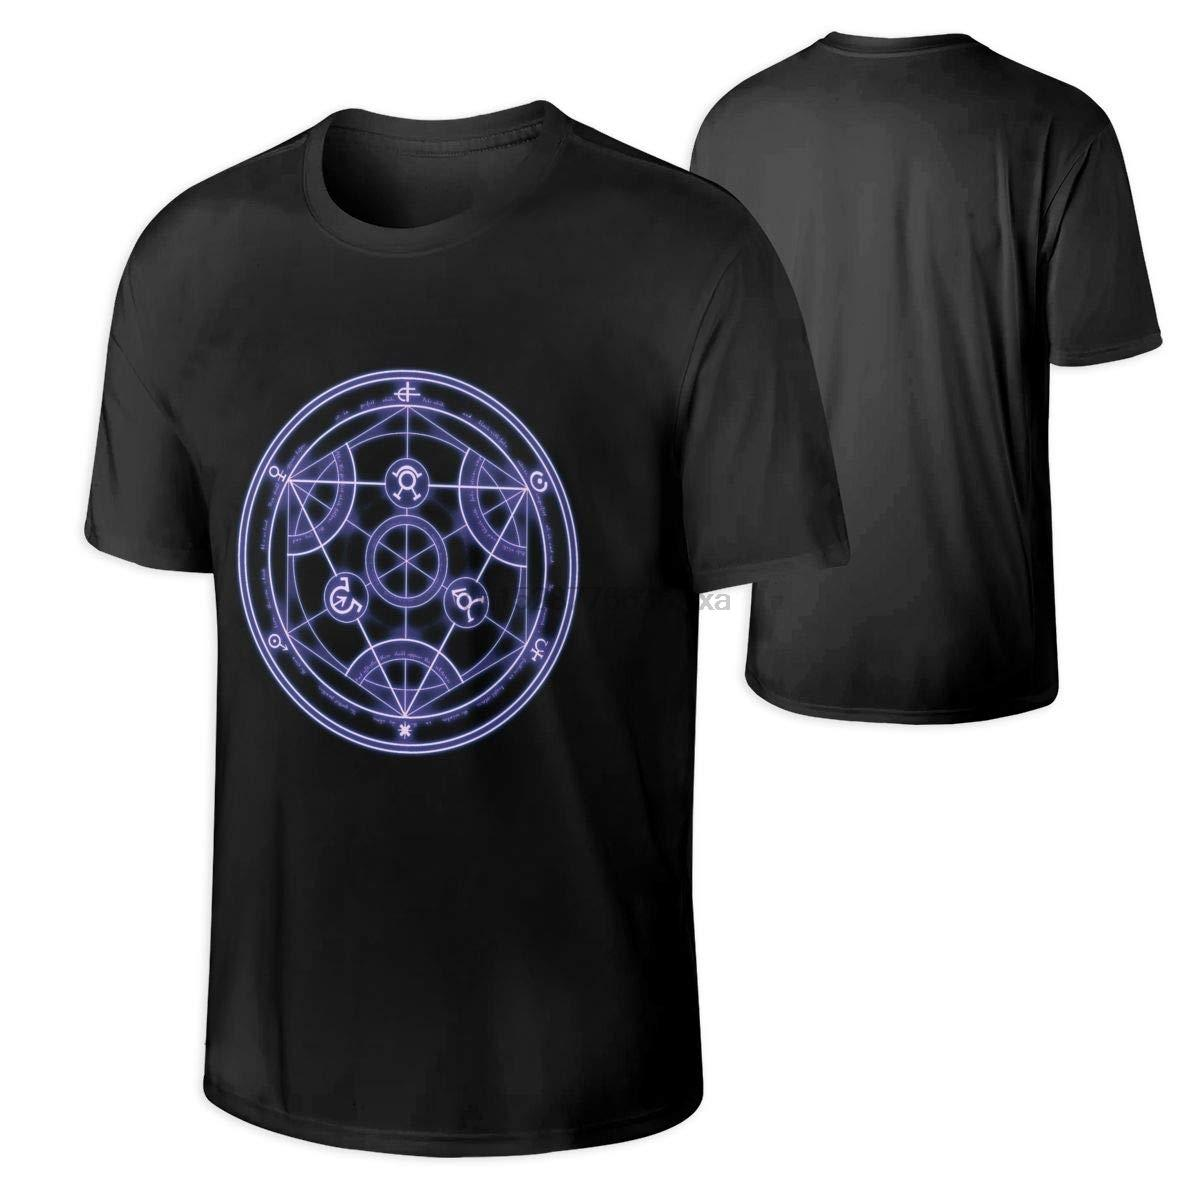 Camicie Fullmetal Alchemist Mens Anime T